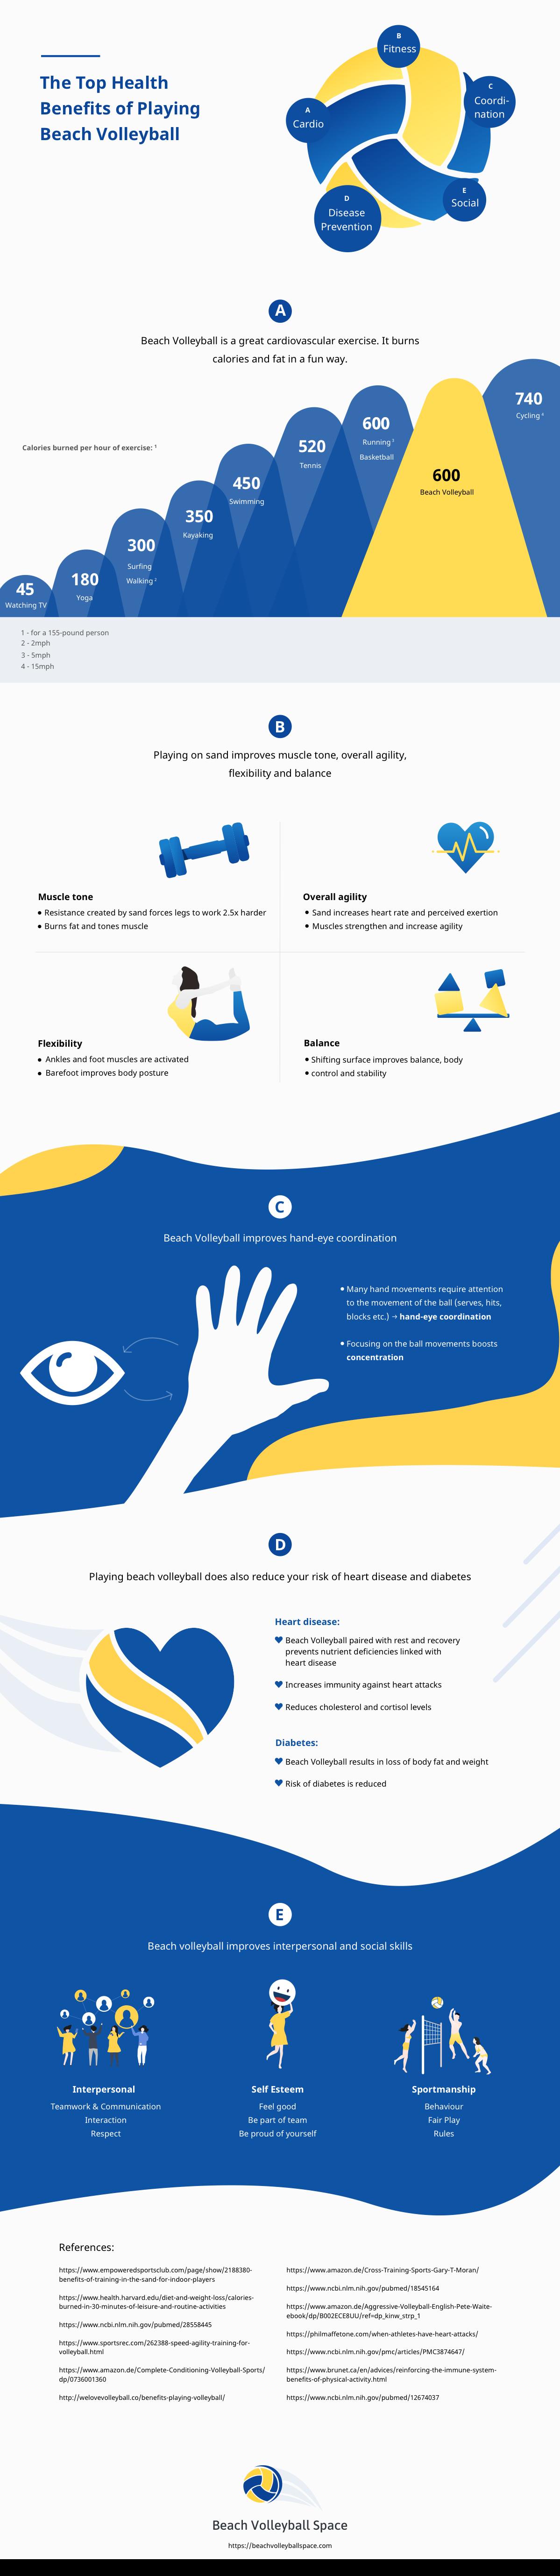 BVS - Infographic Health Benefits